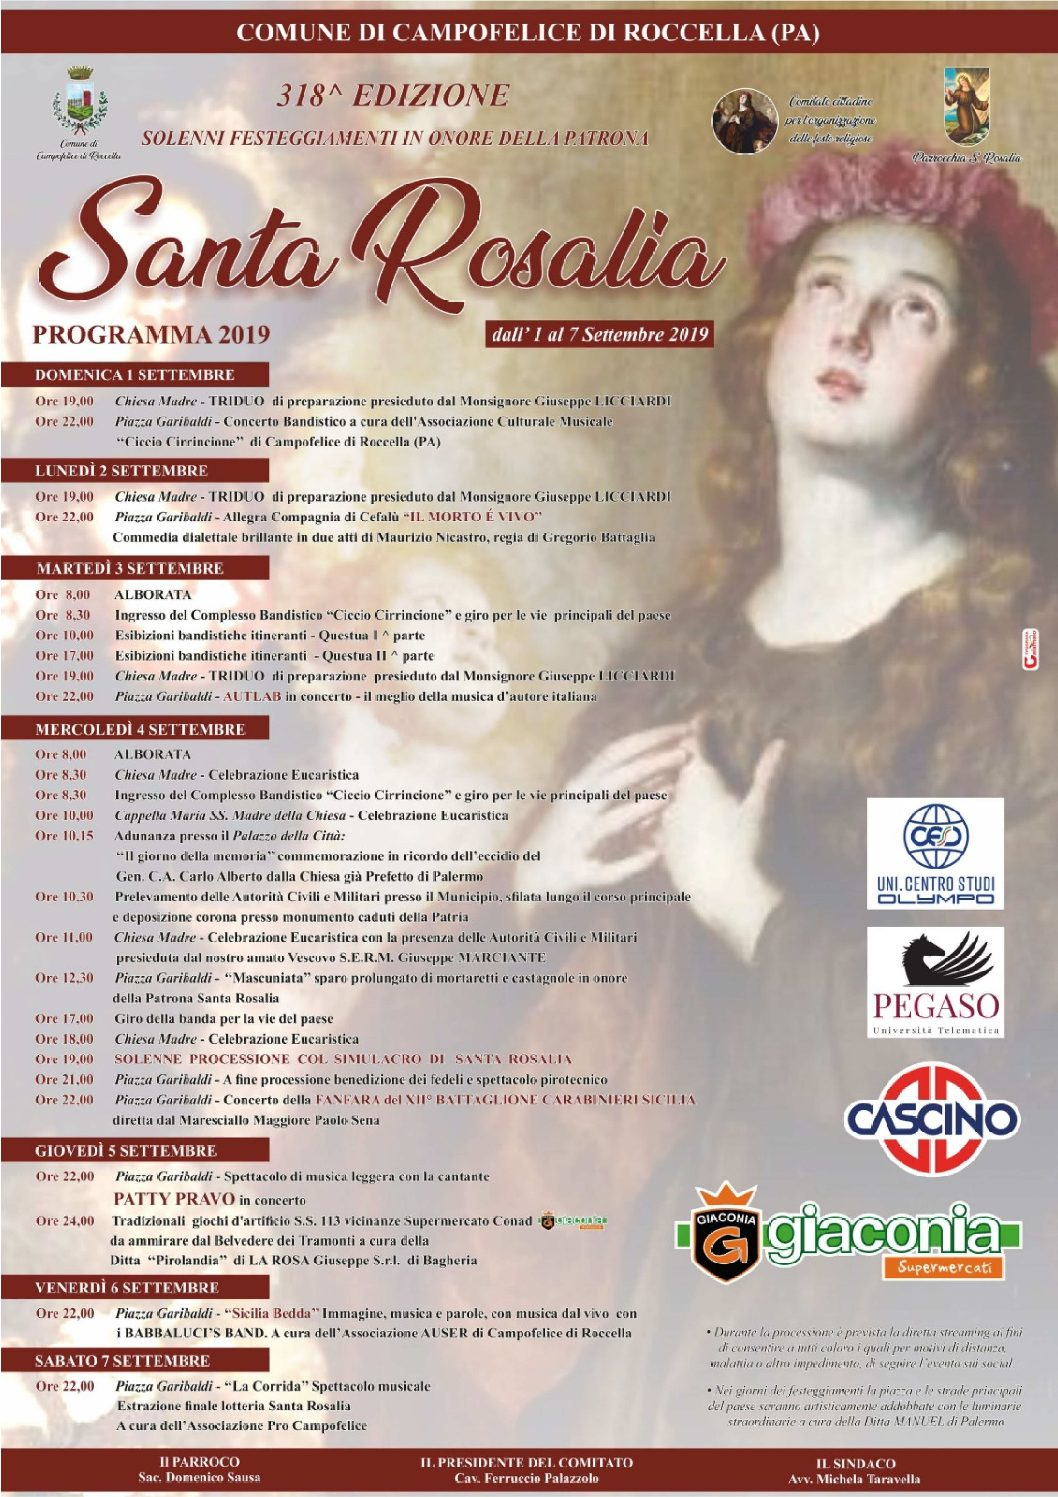 Santa Rosalia 2019 Programma